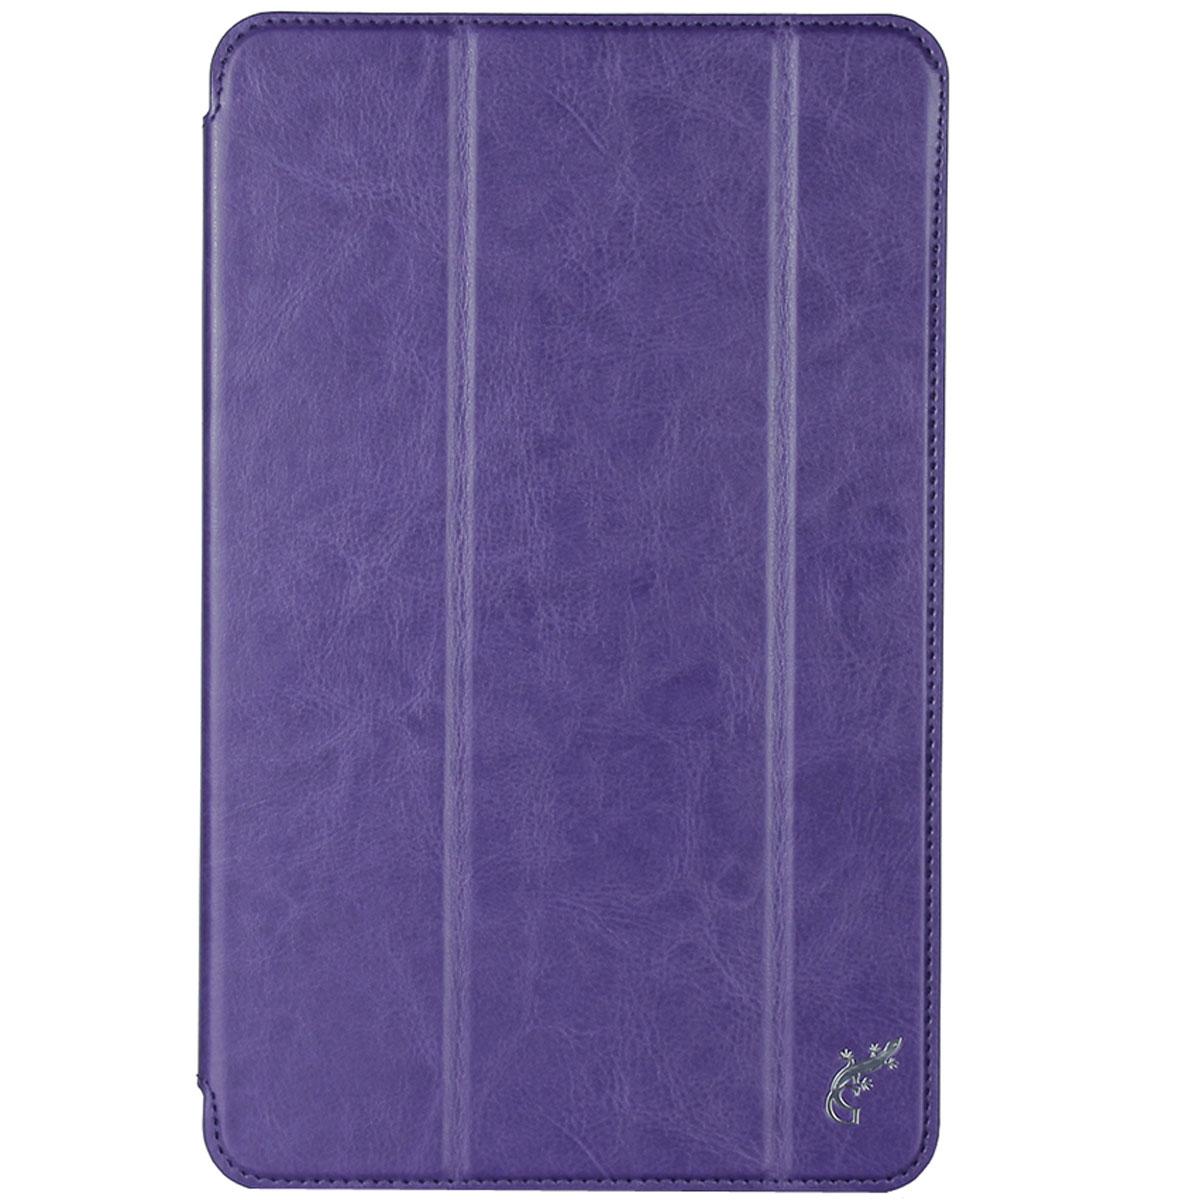 G-Case Slim Premium чехол для Samsung Galaxy Tab Е 9.6, Purple g case slim premium чехол для apple ipad mini 4 white